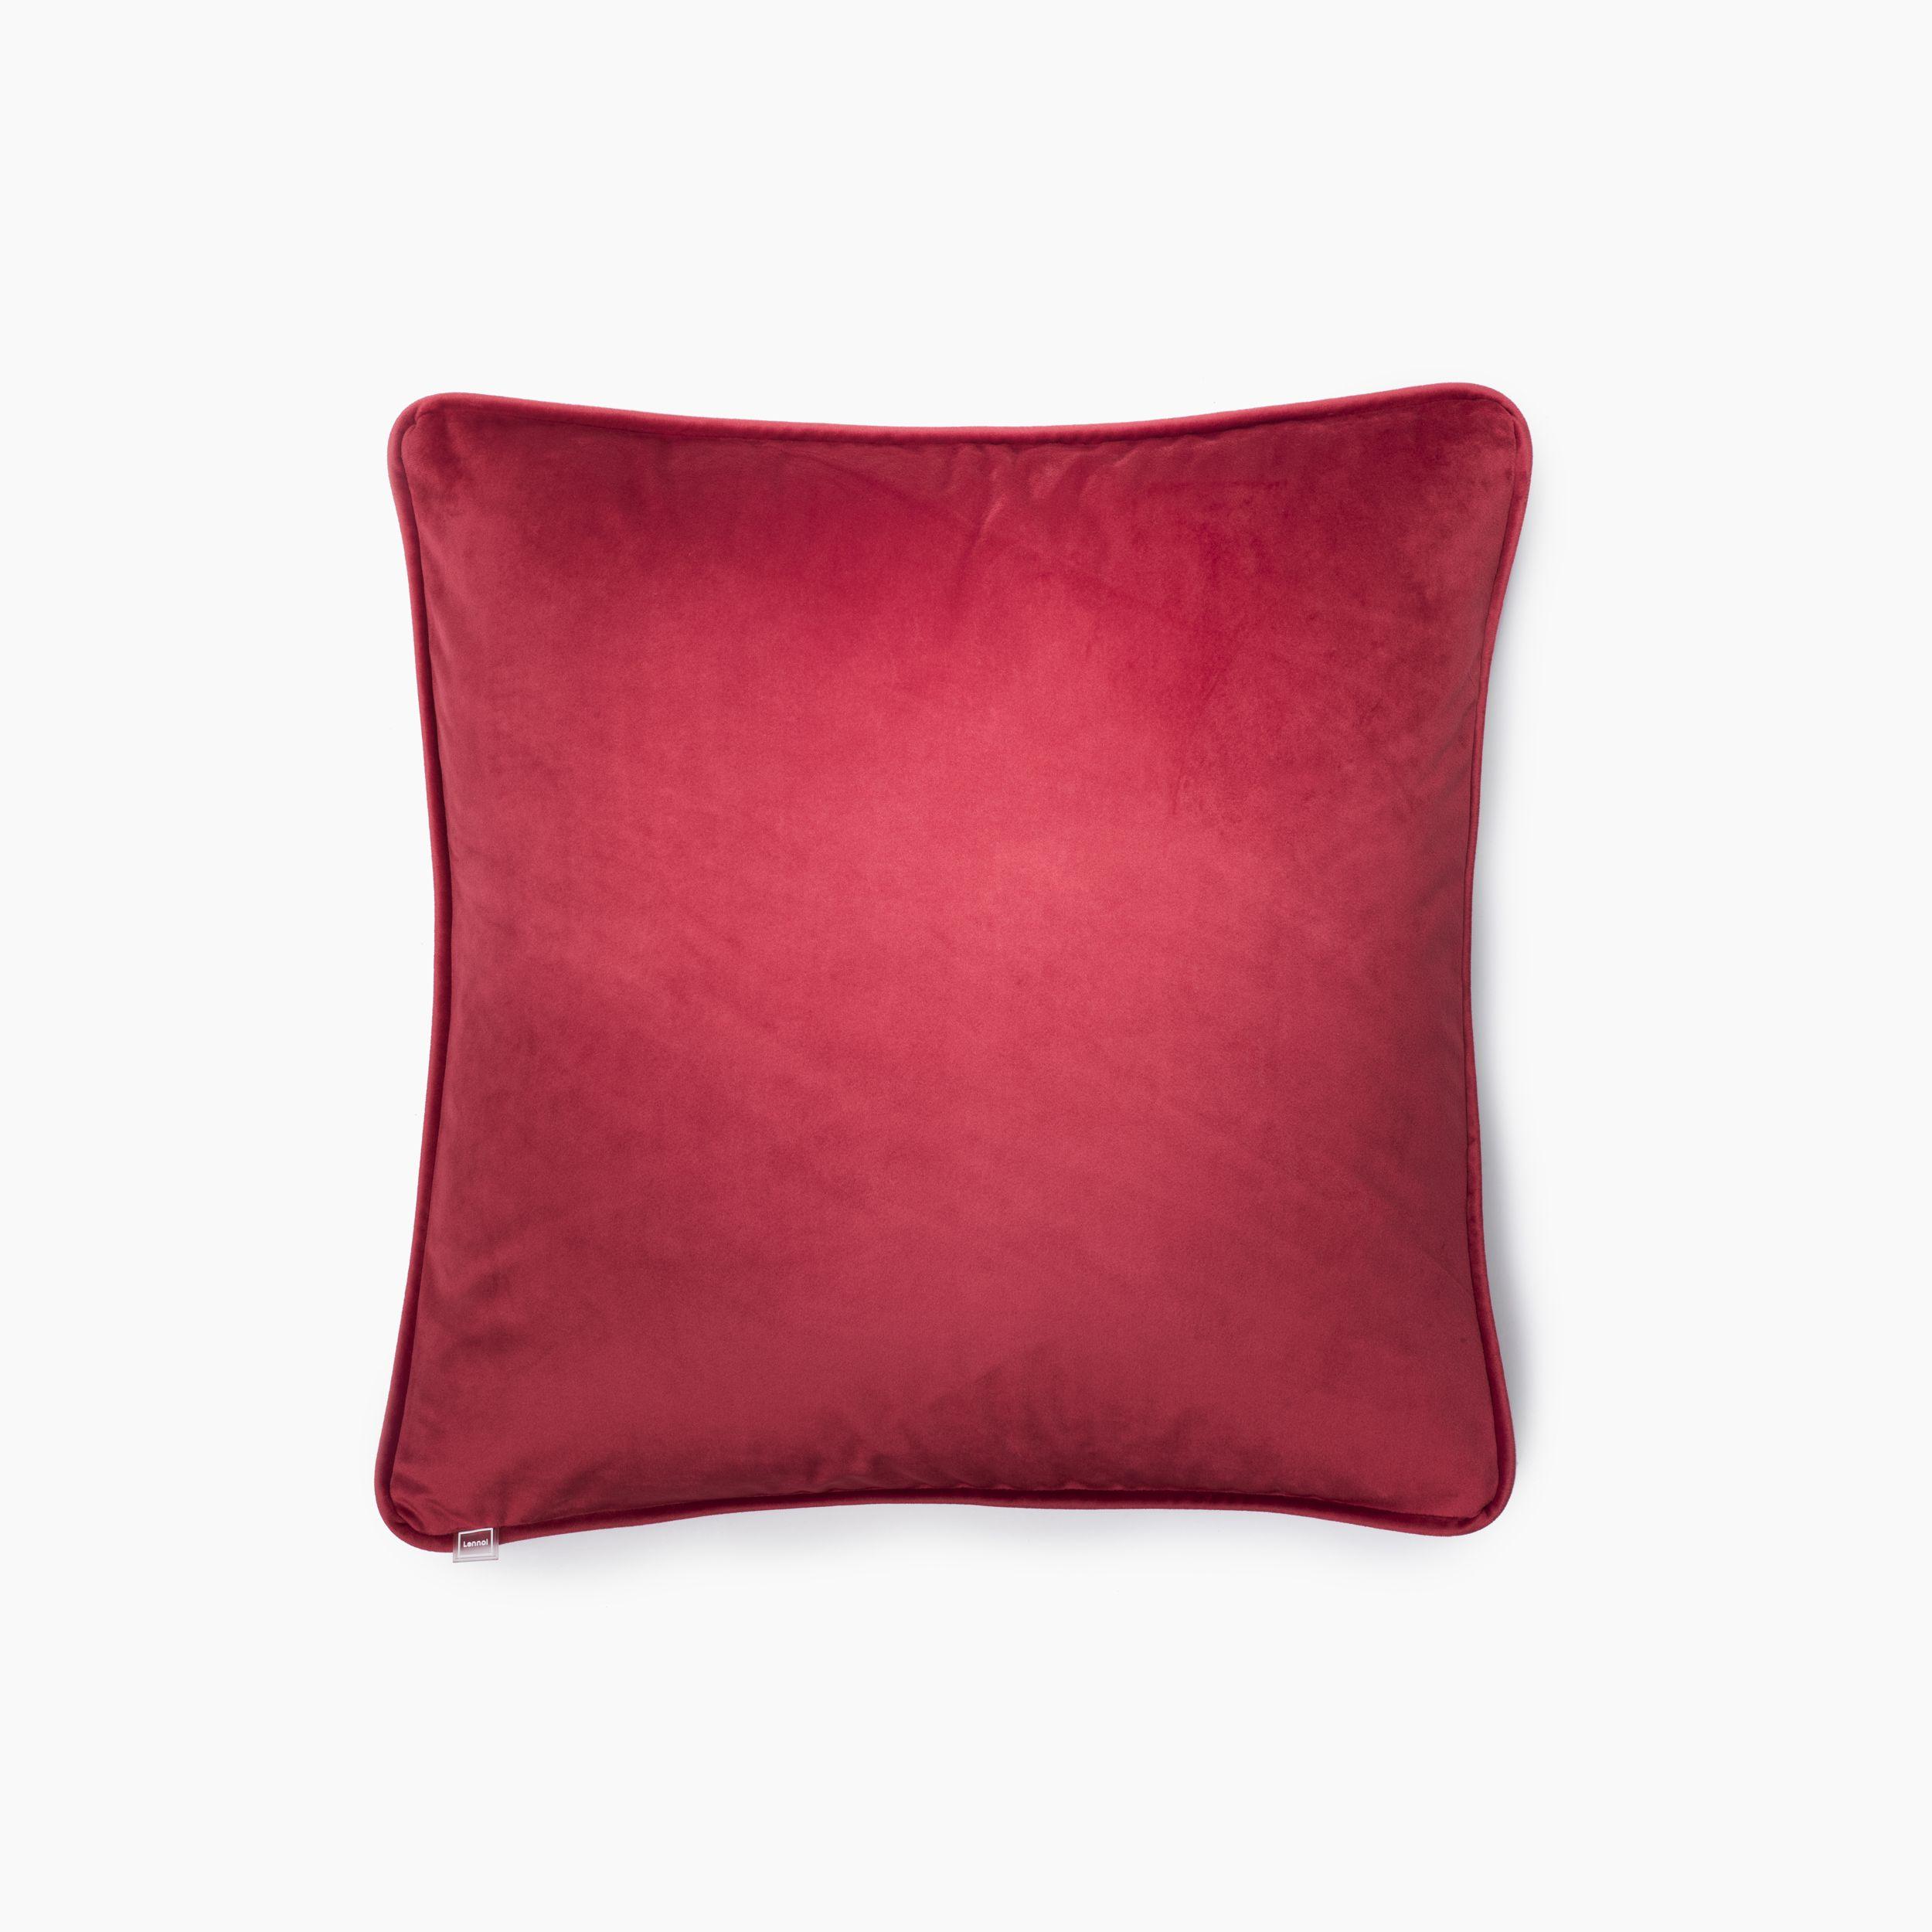 Lennol | MELANIE Cushion, Red